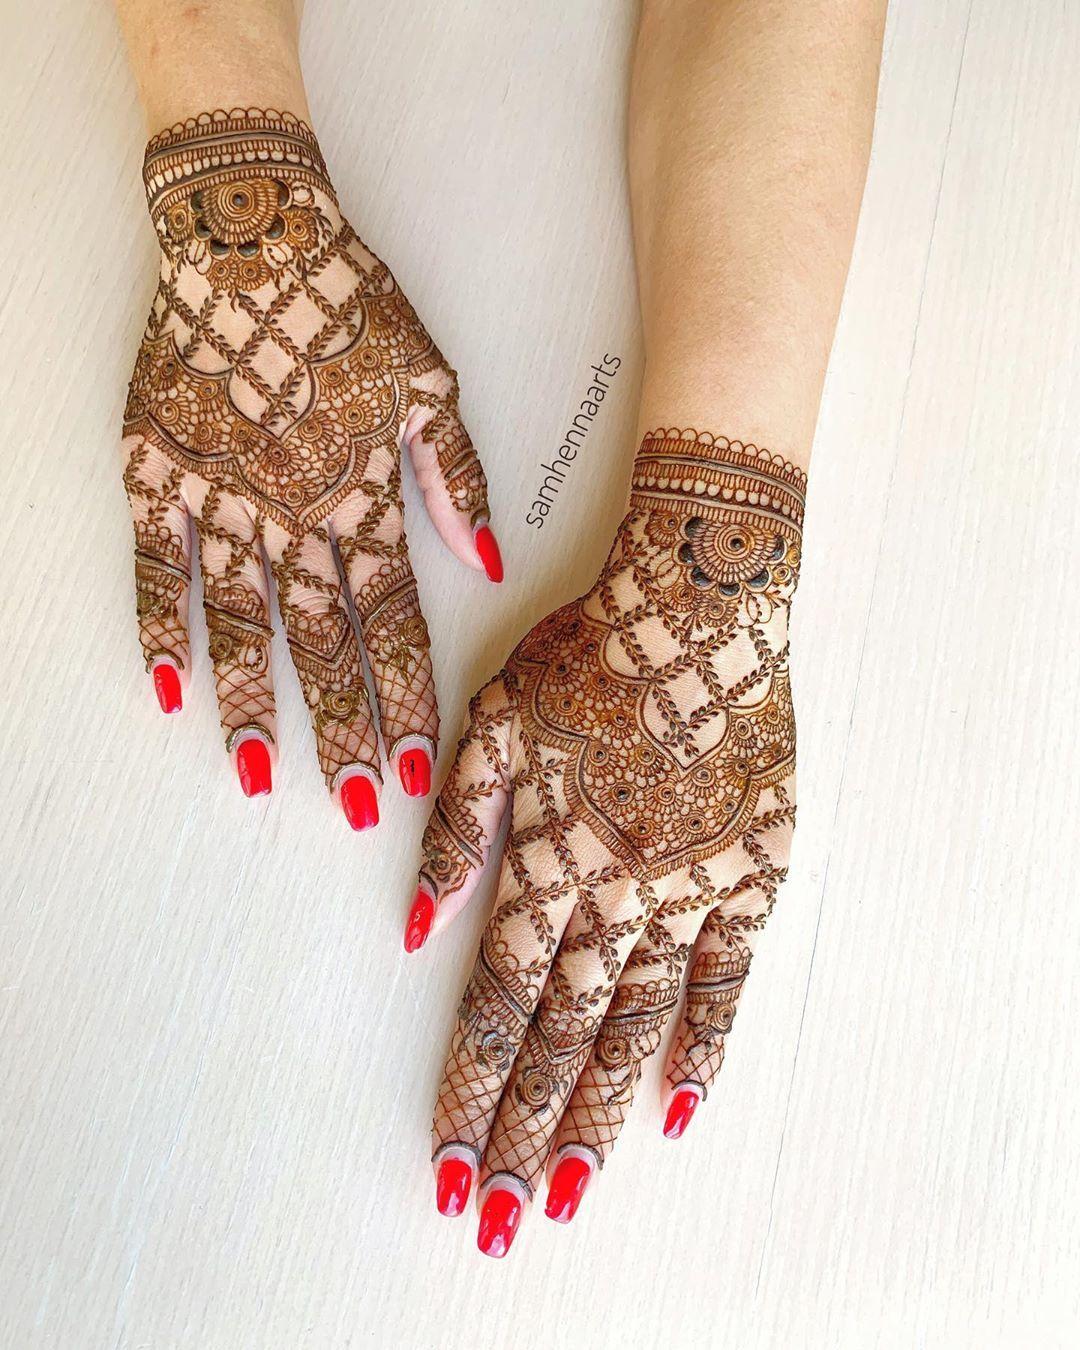 Henna artist on instagram reception henna for my lovely